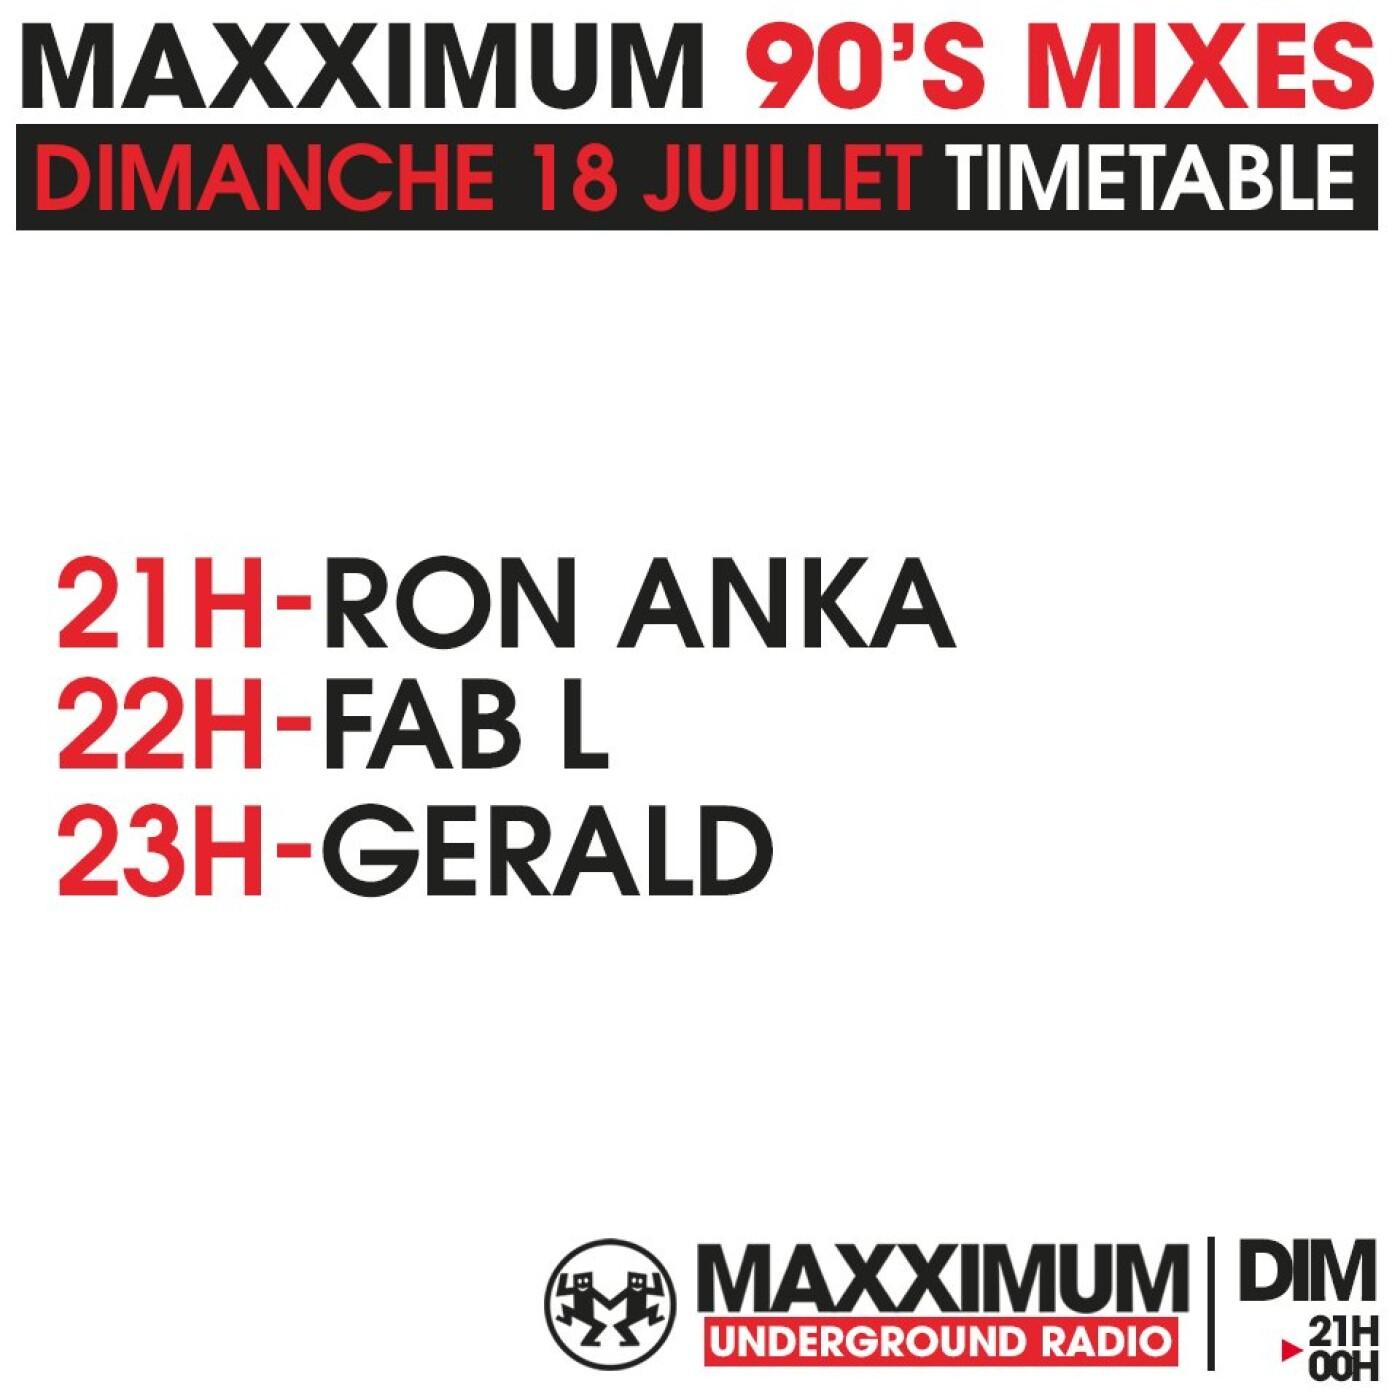 PANORAMAXX 90's : FAB L